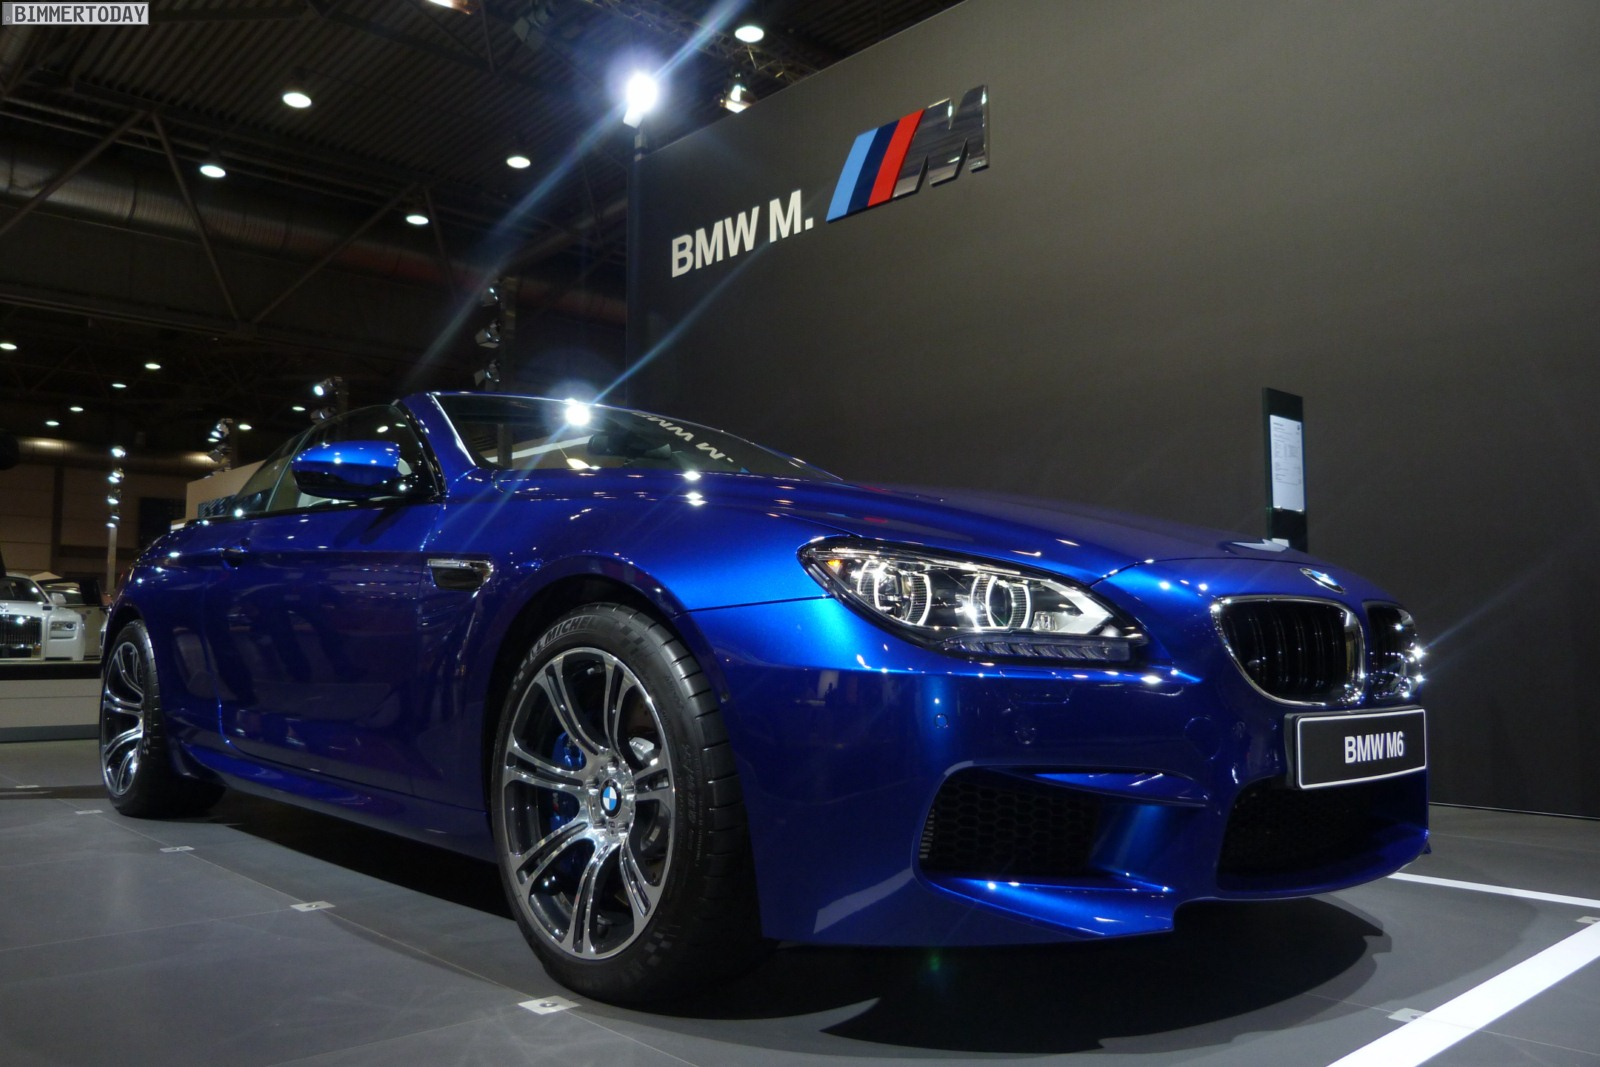 2012 Leipzig Auto Show Bmw M6 Convertible In San Marino Blue